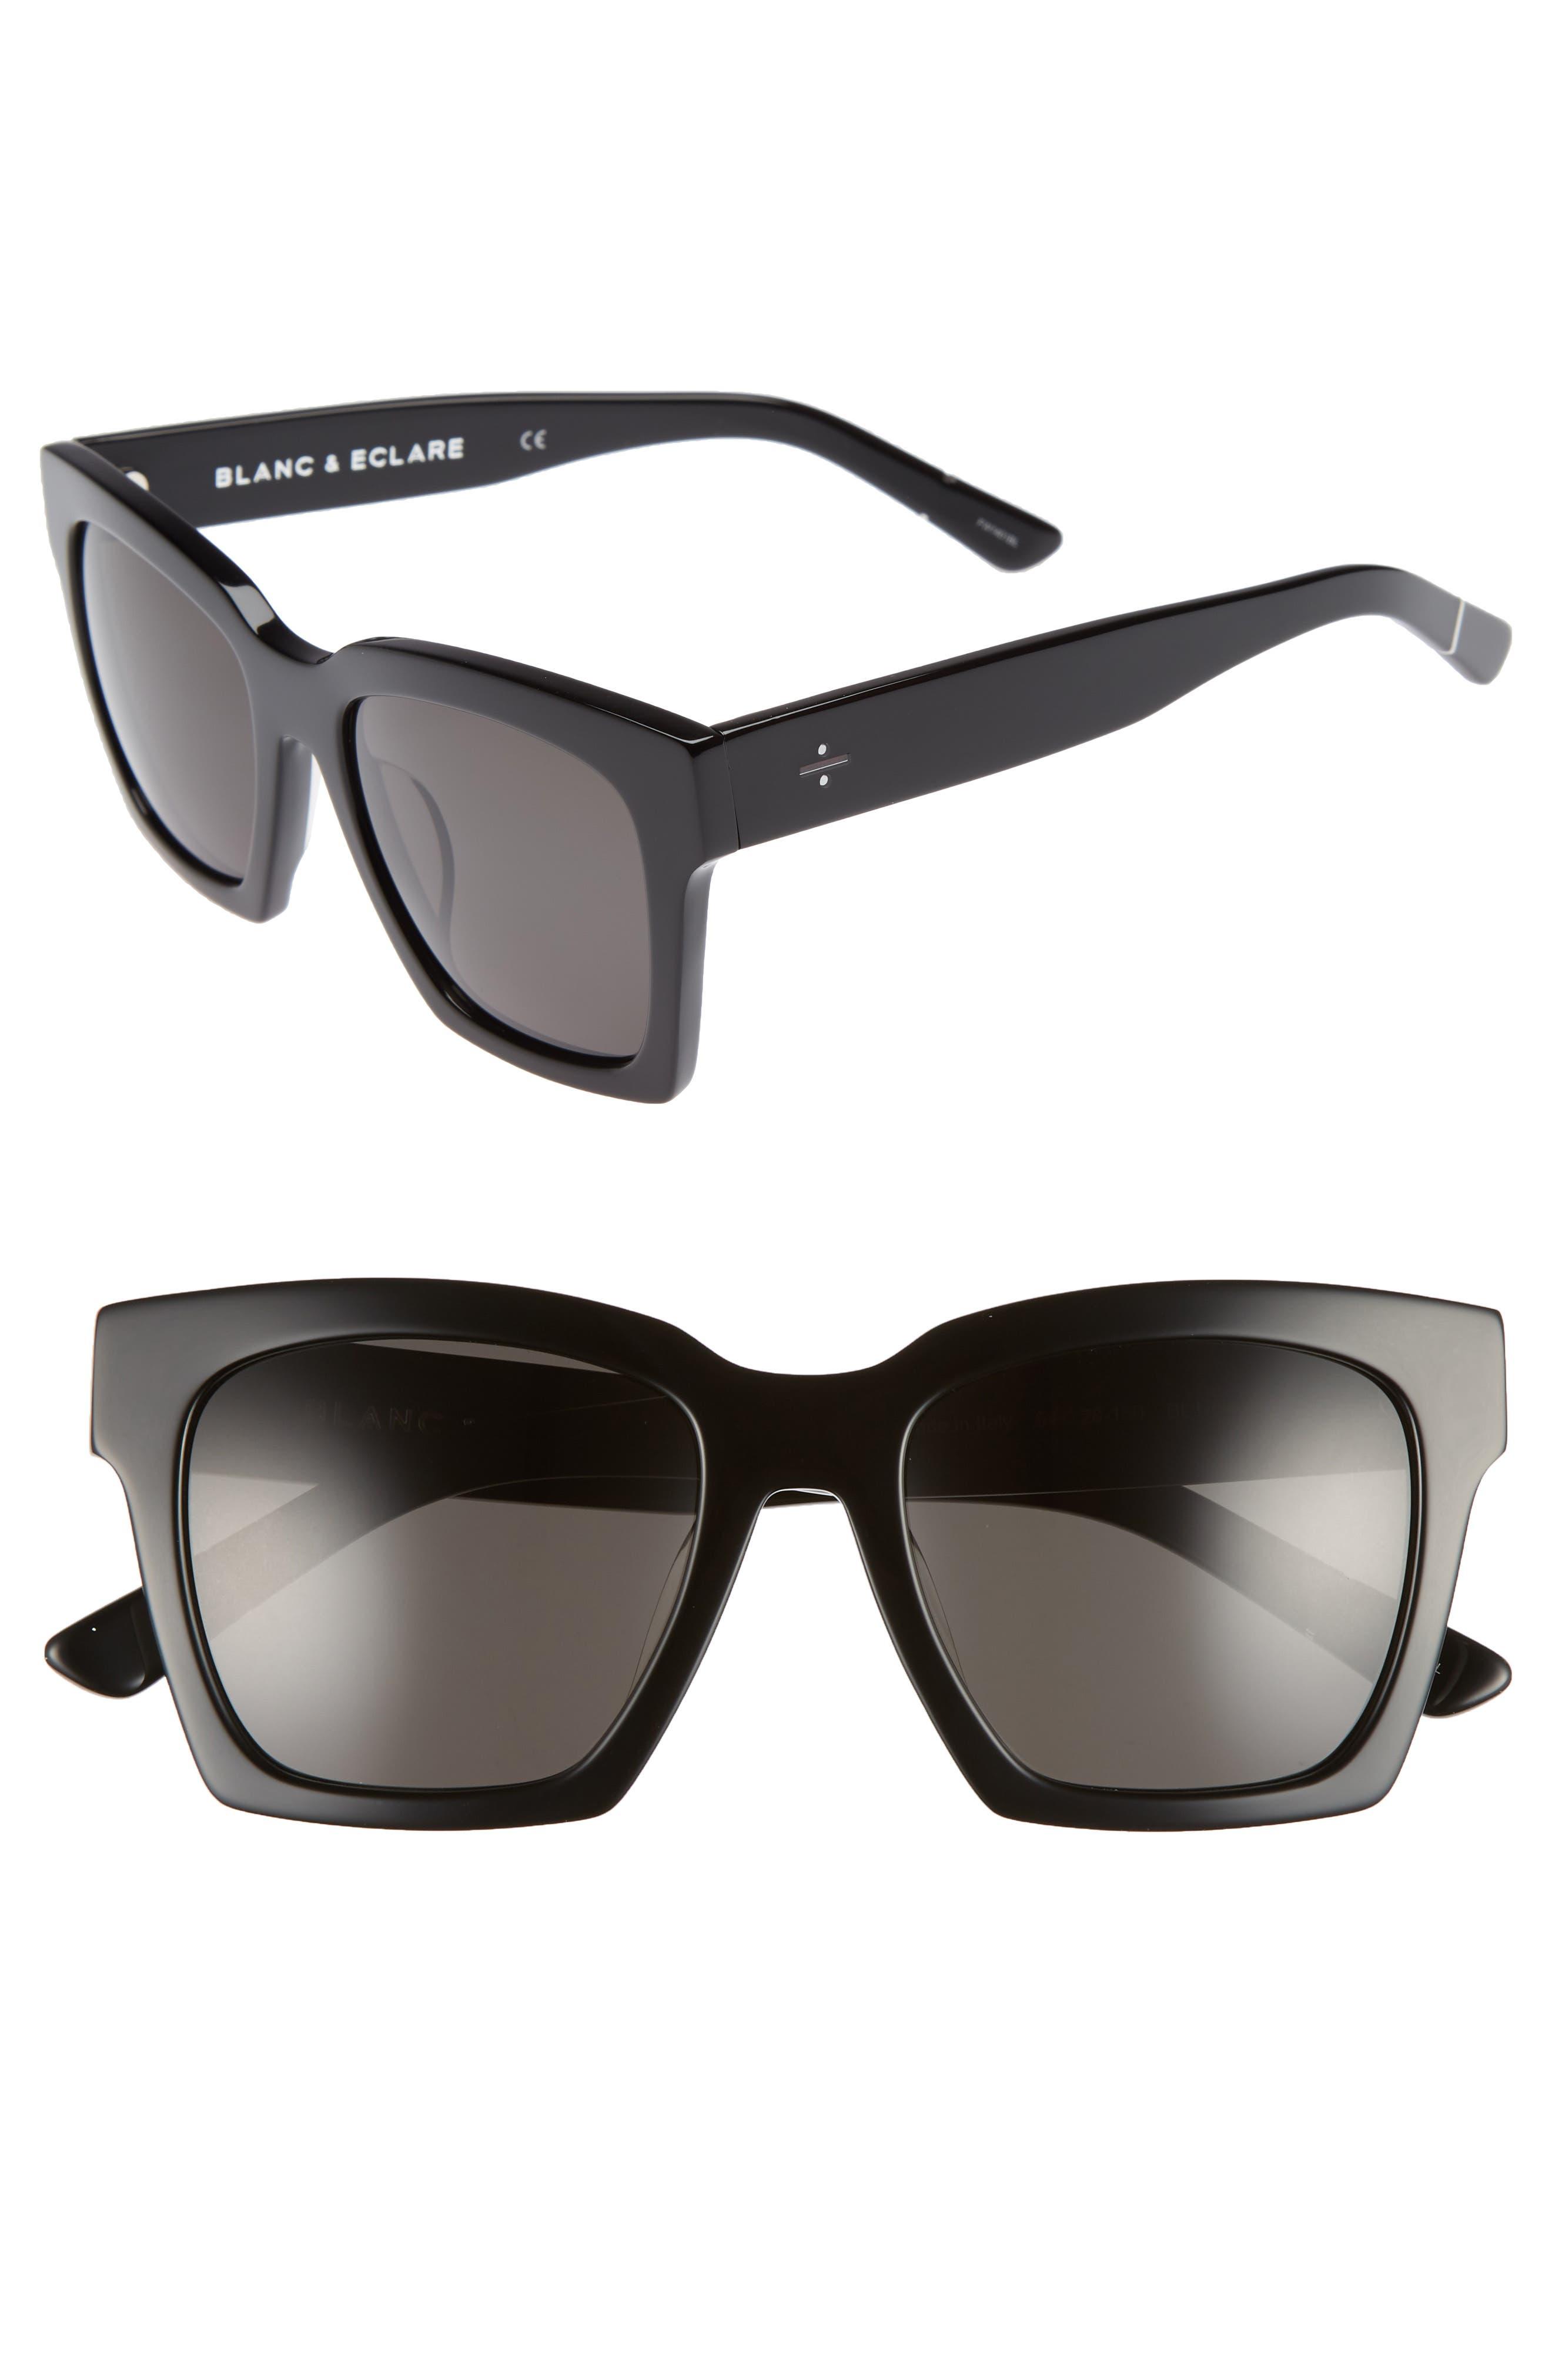 BLANC & ECLARE New York 54mm Polarized Sunglasses,                         Main,                         color, BLACK